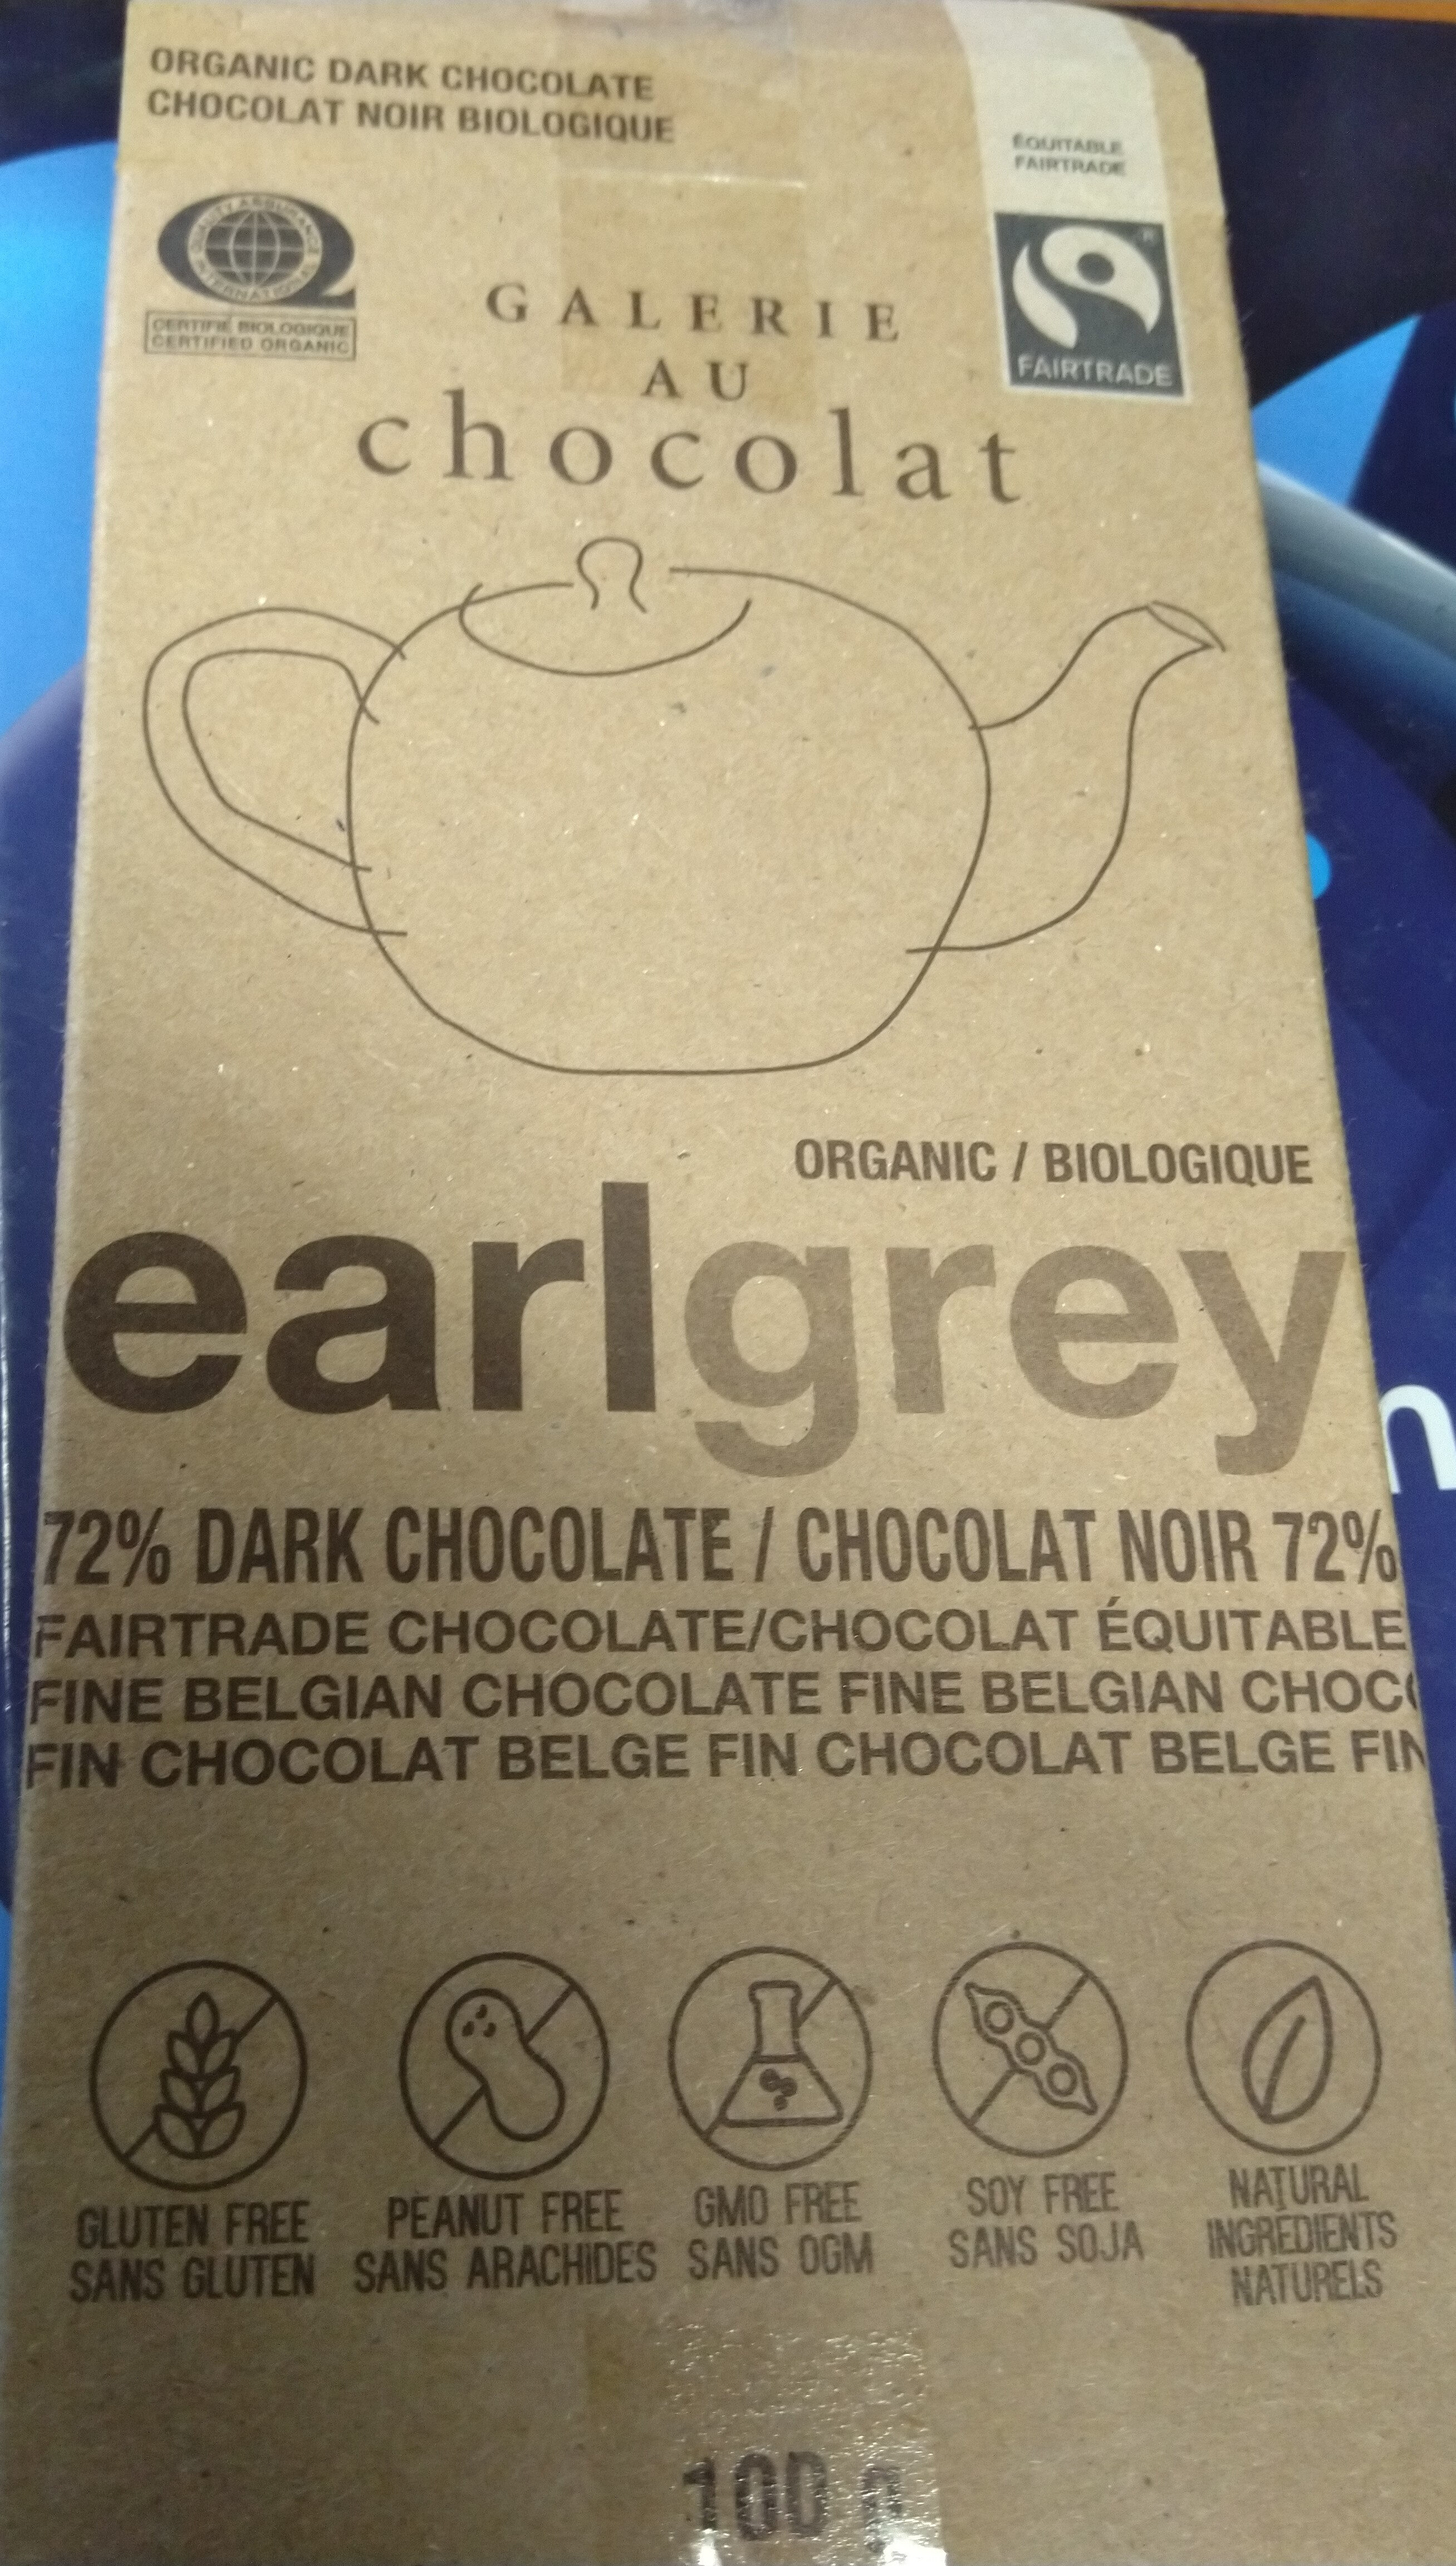 Earl grey - Product - en